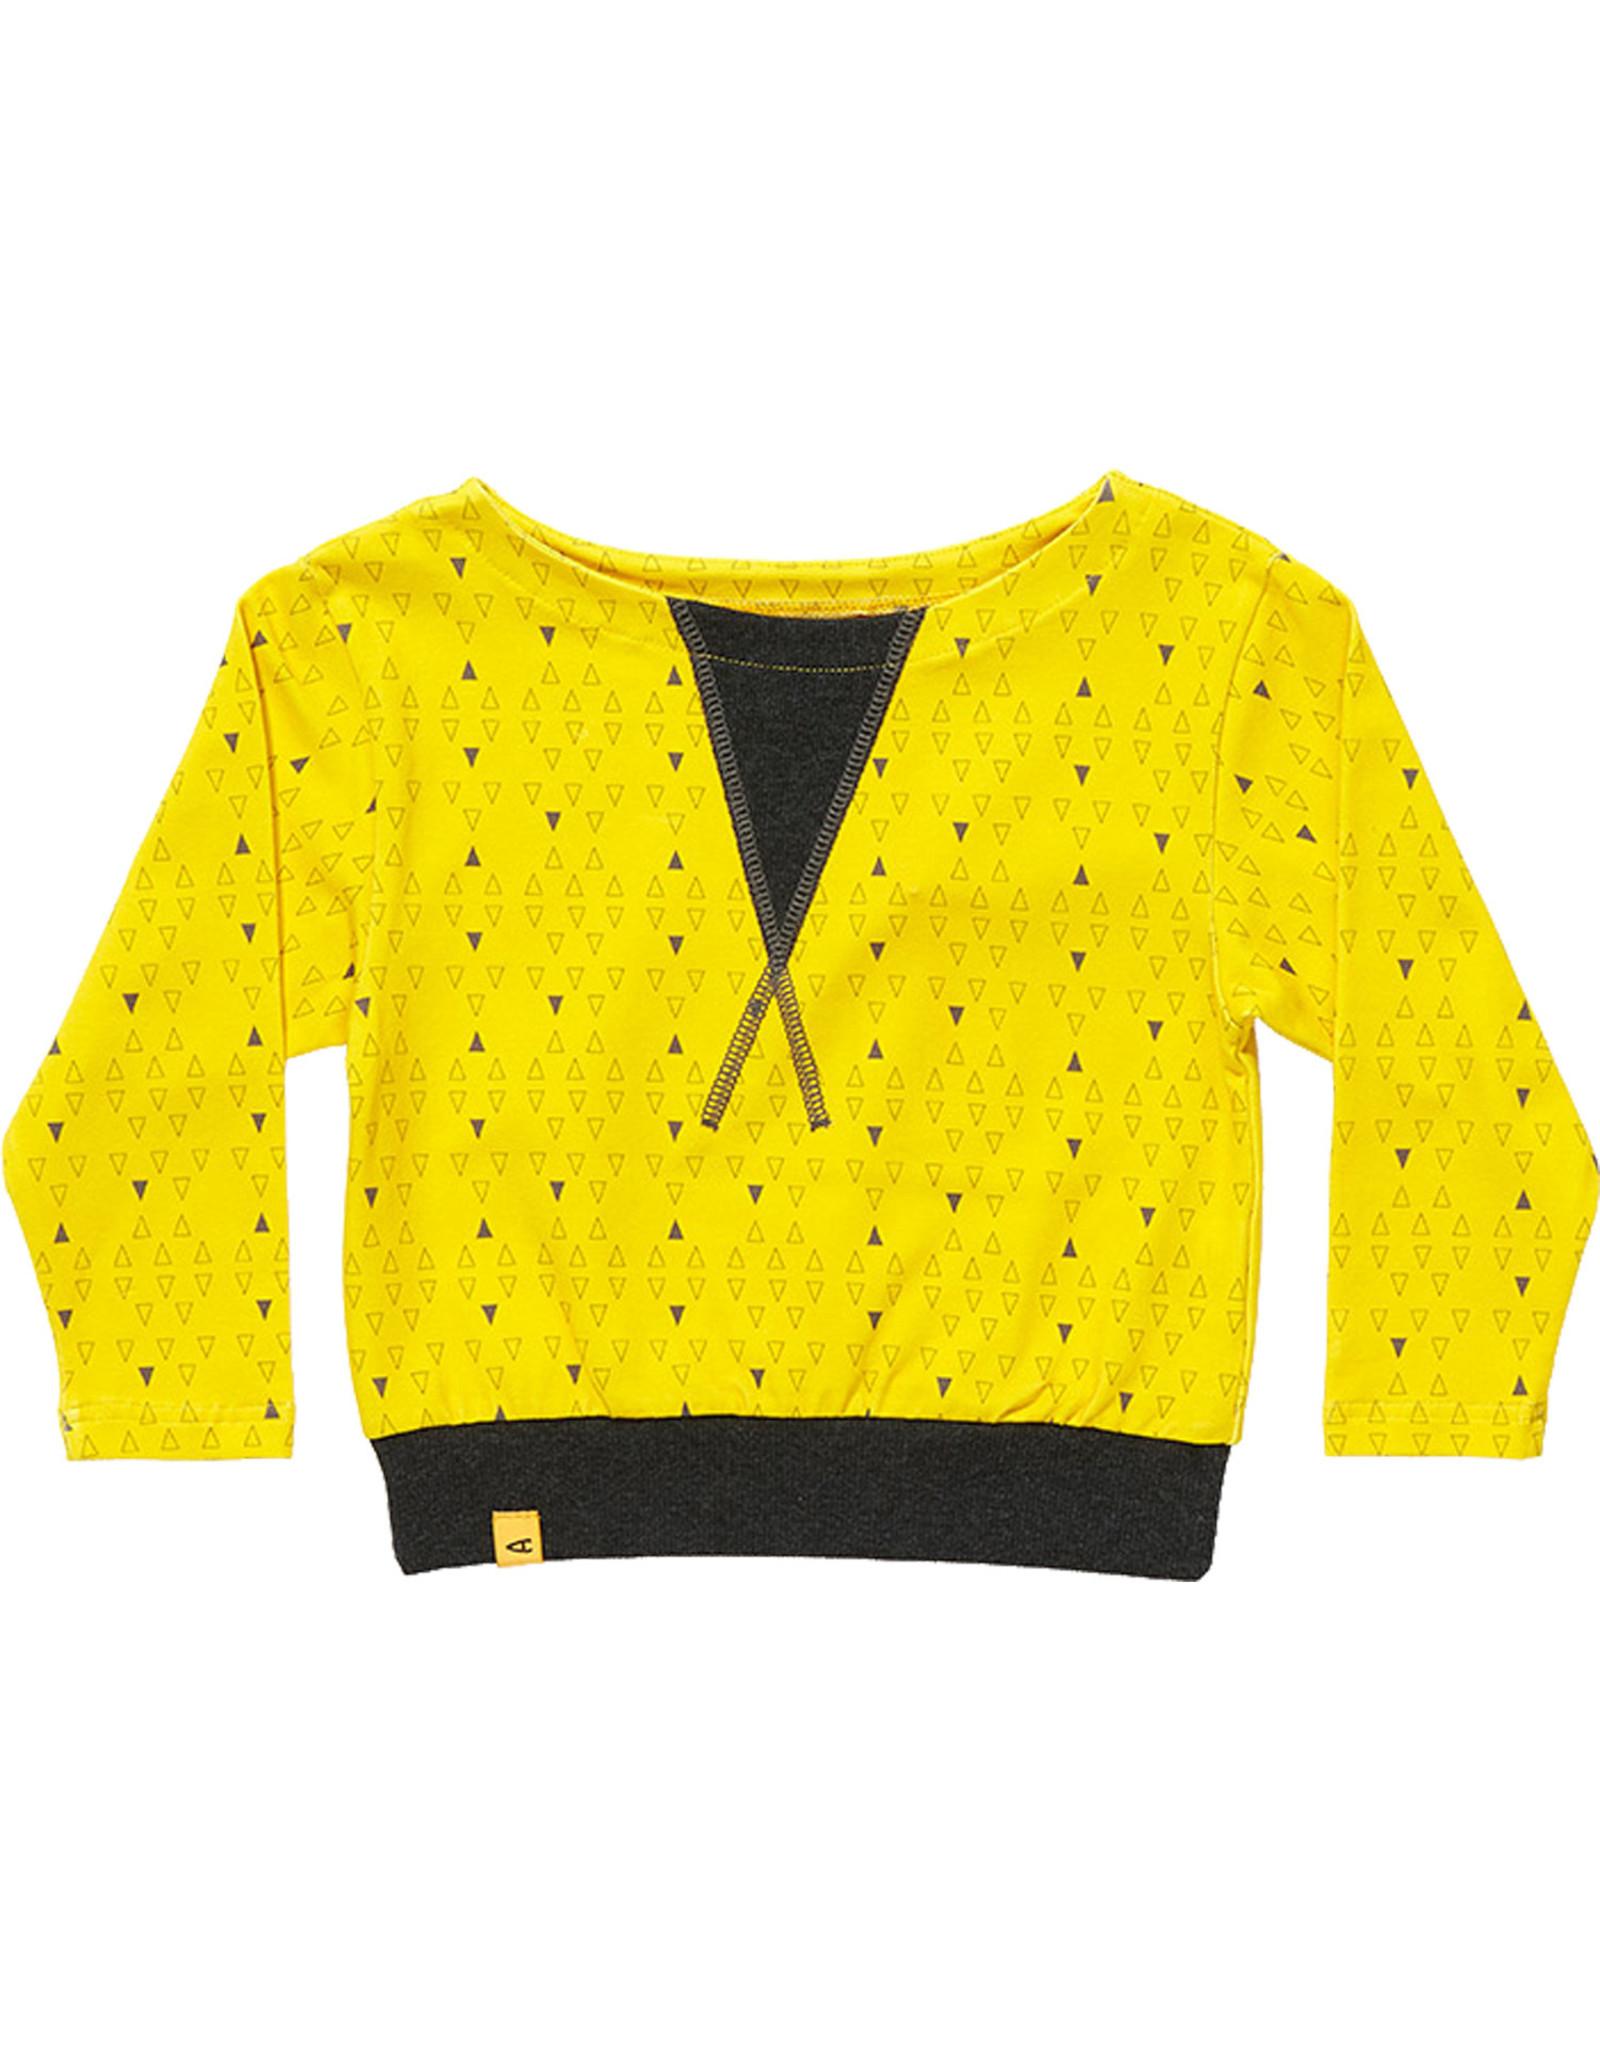 Albababy Children's sweater - Fenja yellow triangle